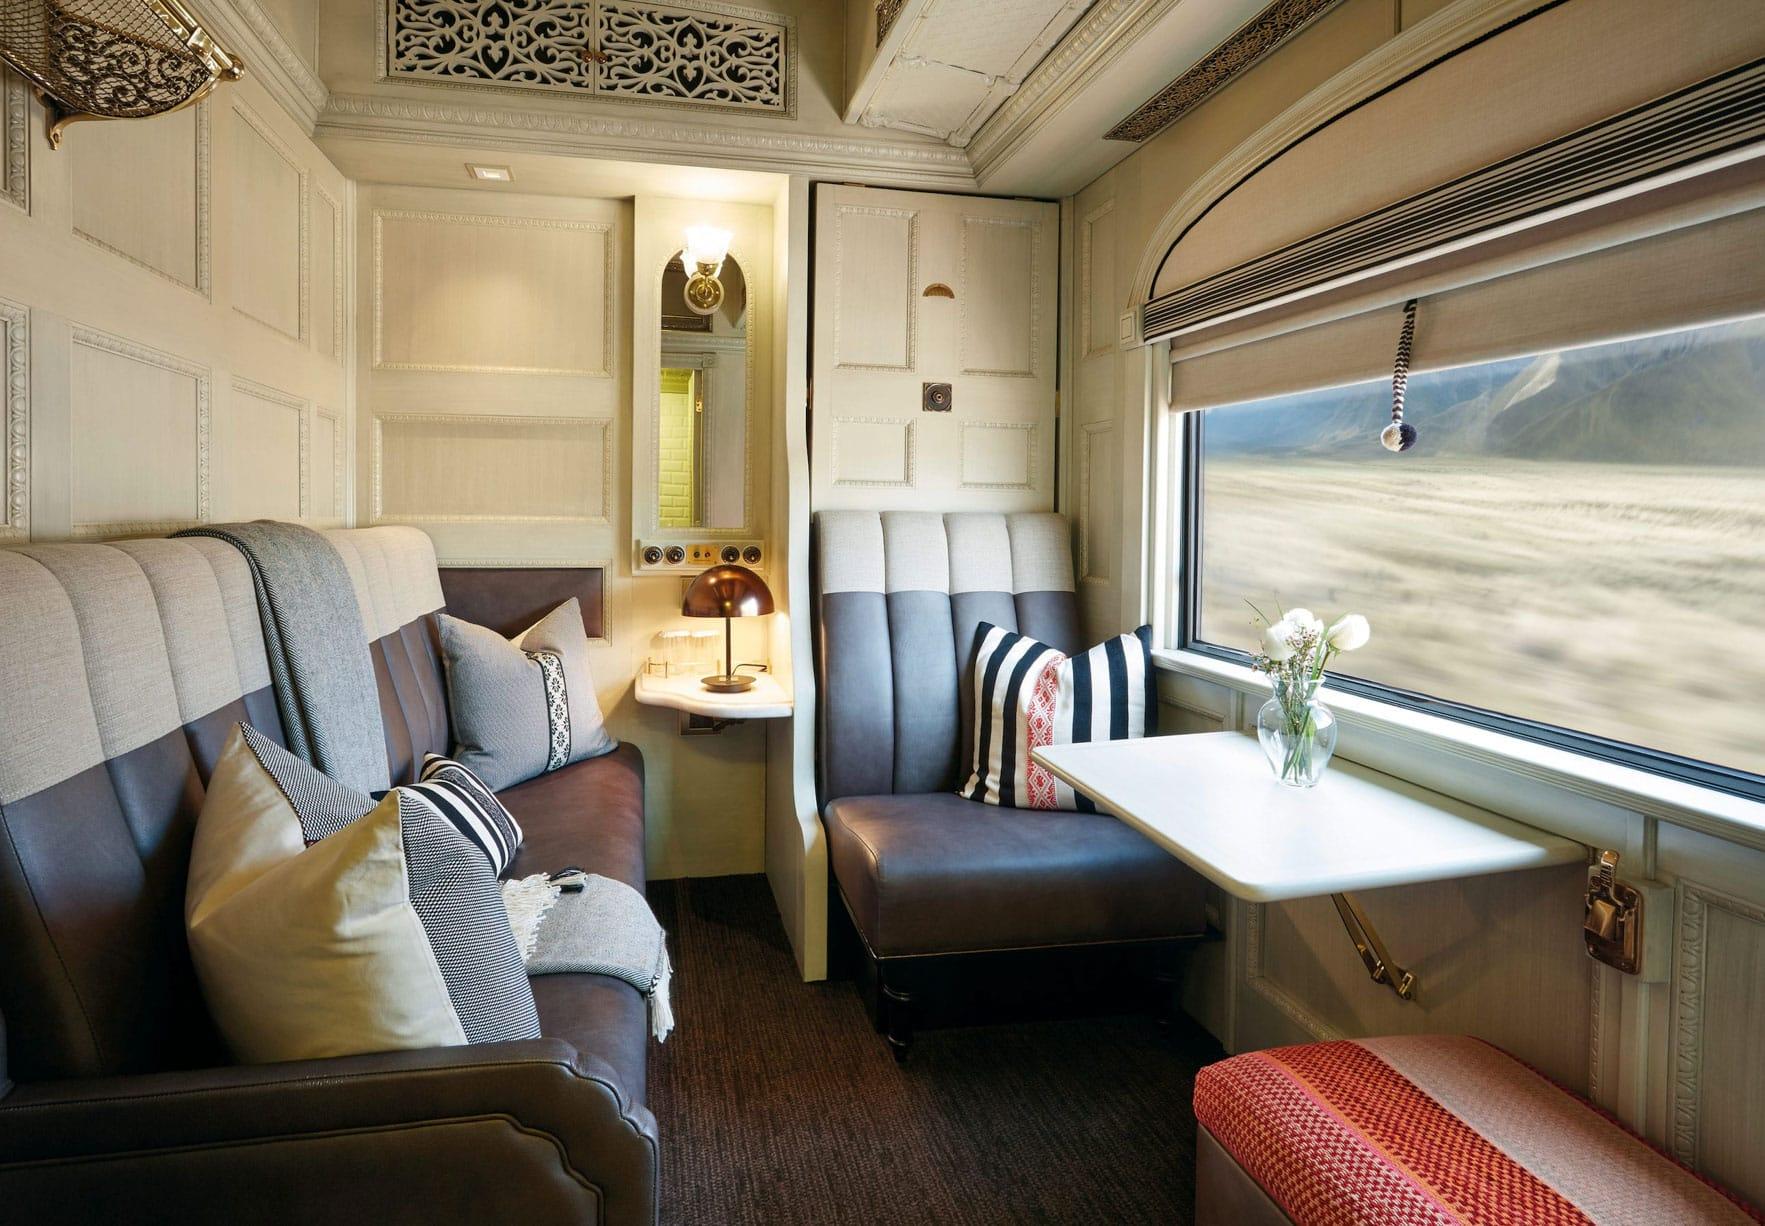 Living area on the Belmond Andean Explorer train